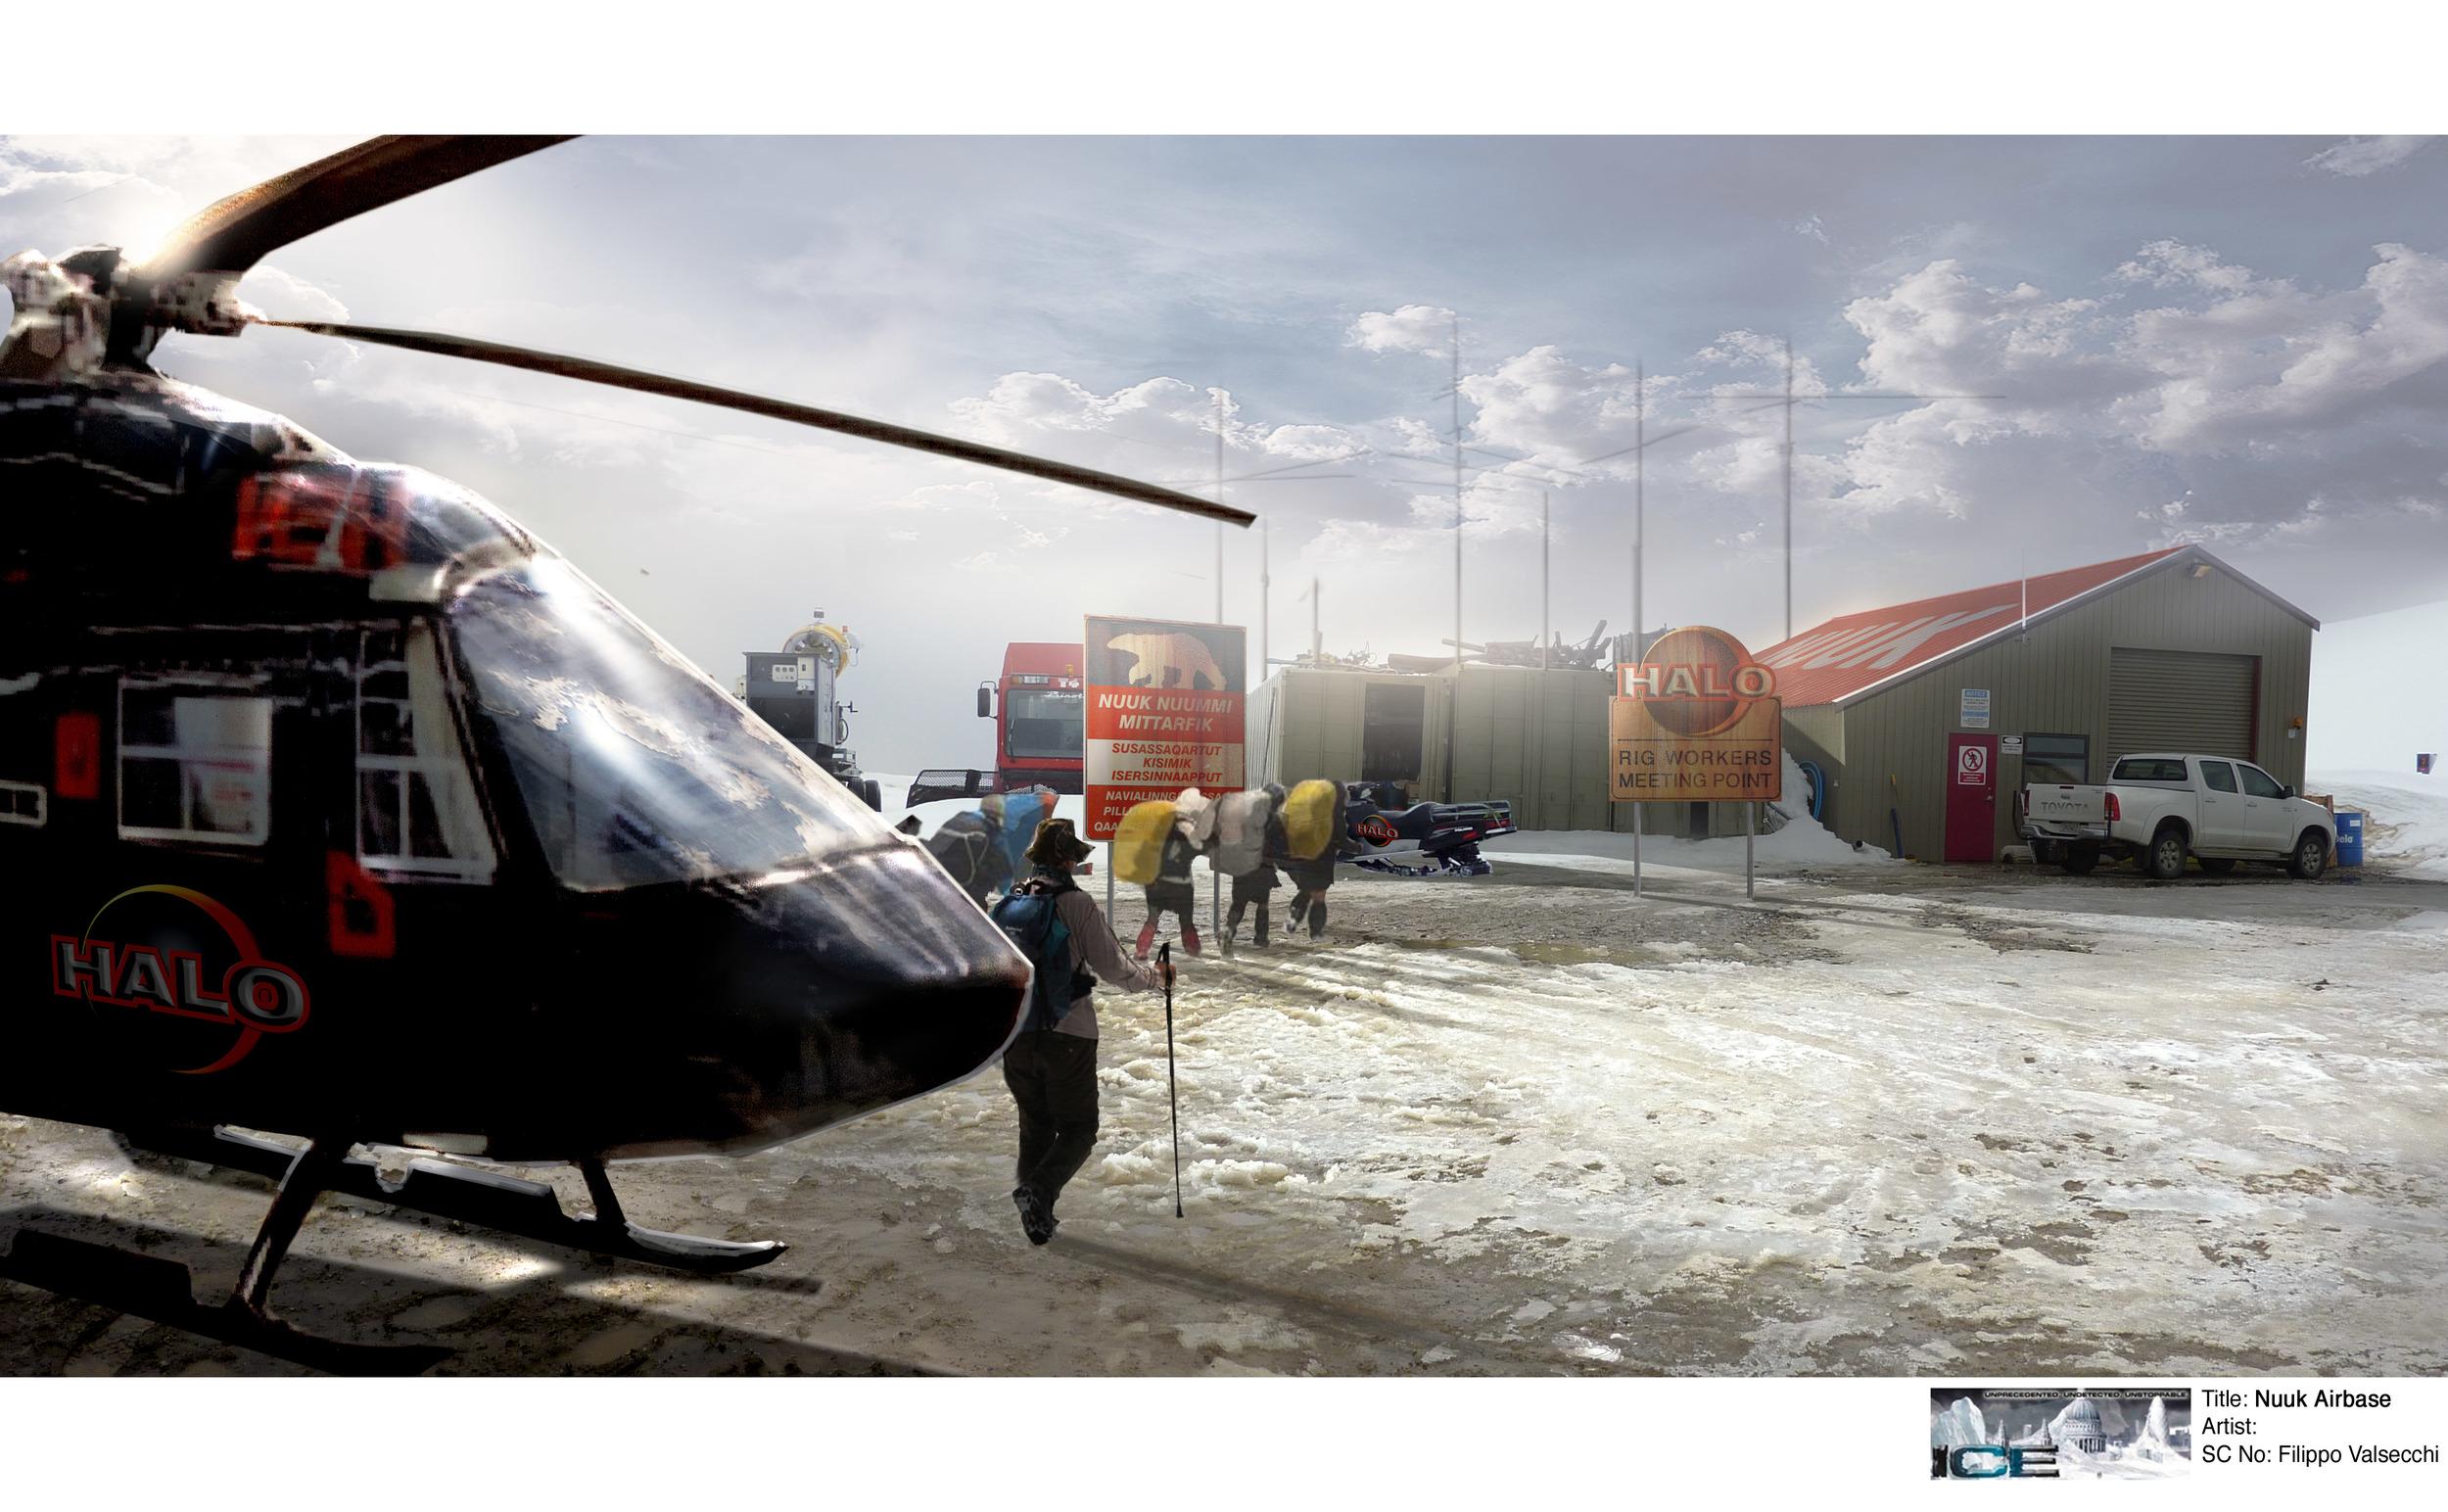 Nuuk_airbase.jpg